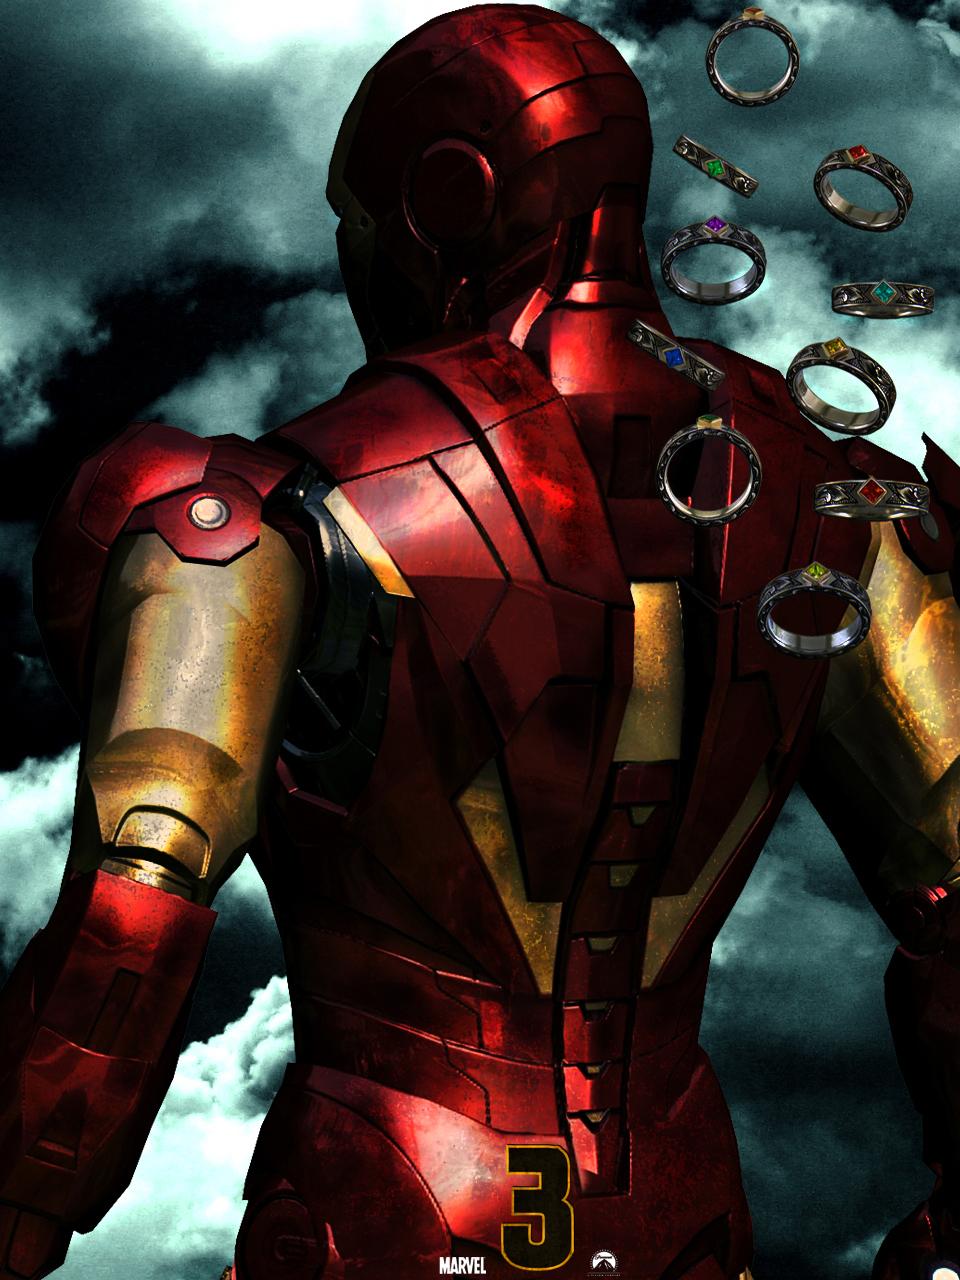 Iron man 3 by agustin09